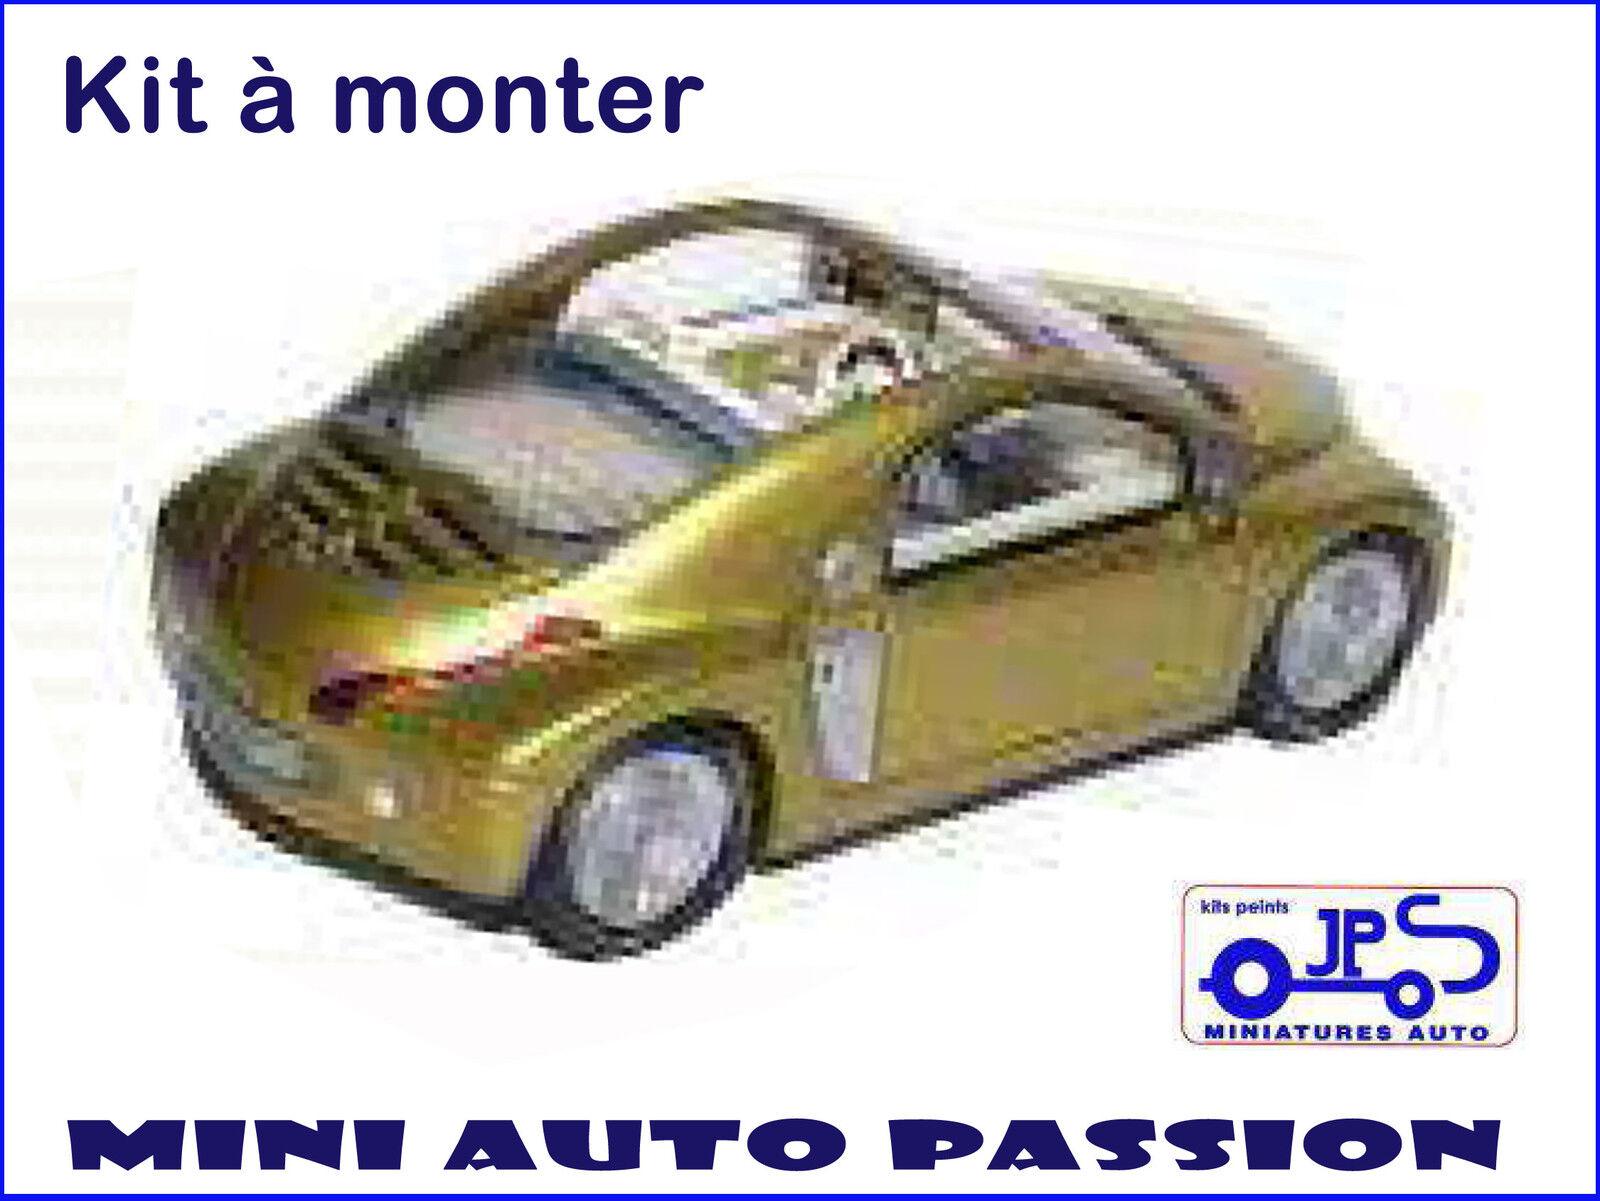 garantizado Kit JPS Prépeint Prépeint Prépeint - Renault 4CV Fifitie - Concept Coche - Echelle 1 43  Nuevos productos de artículos novedosos.